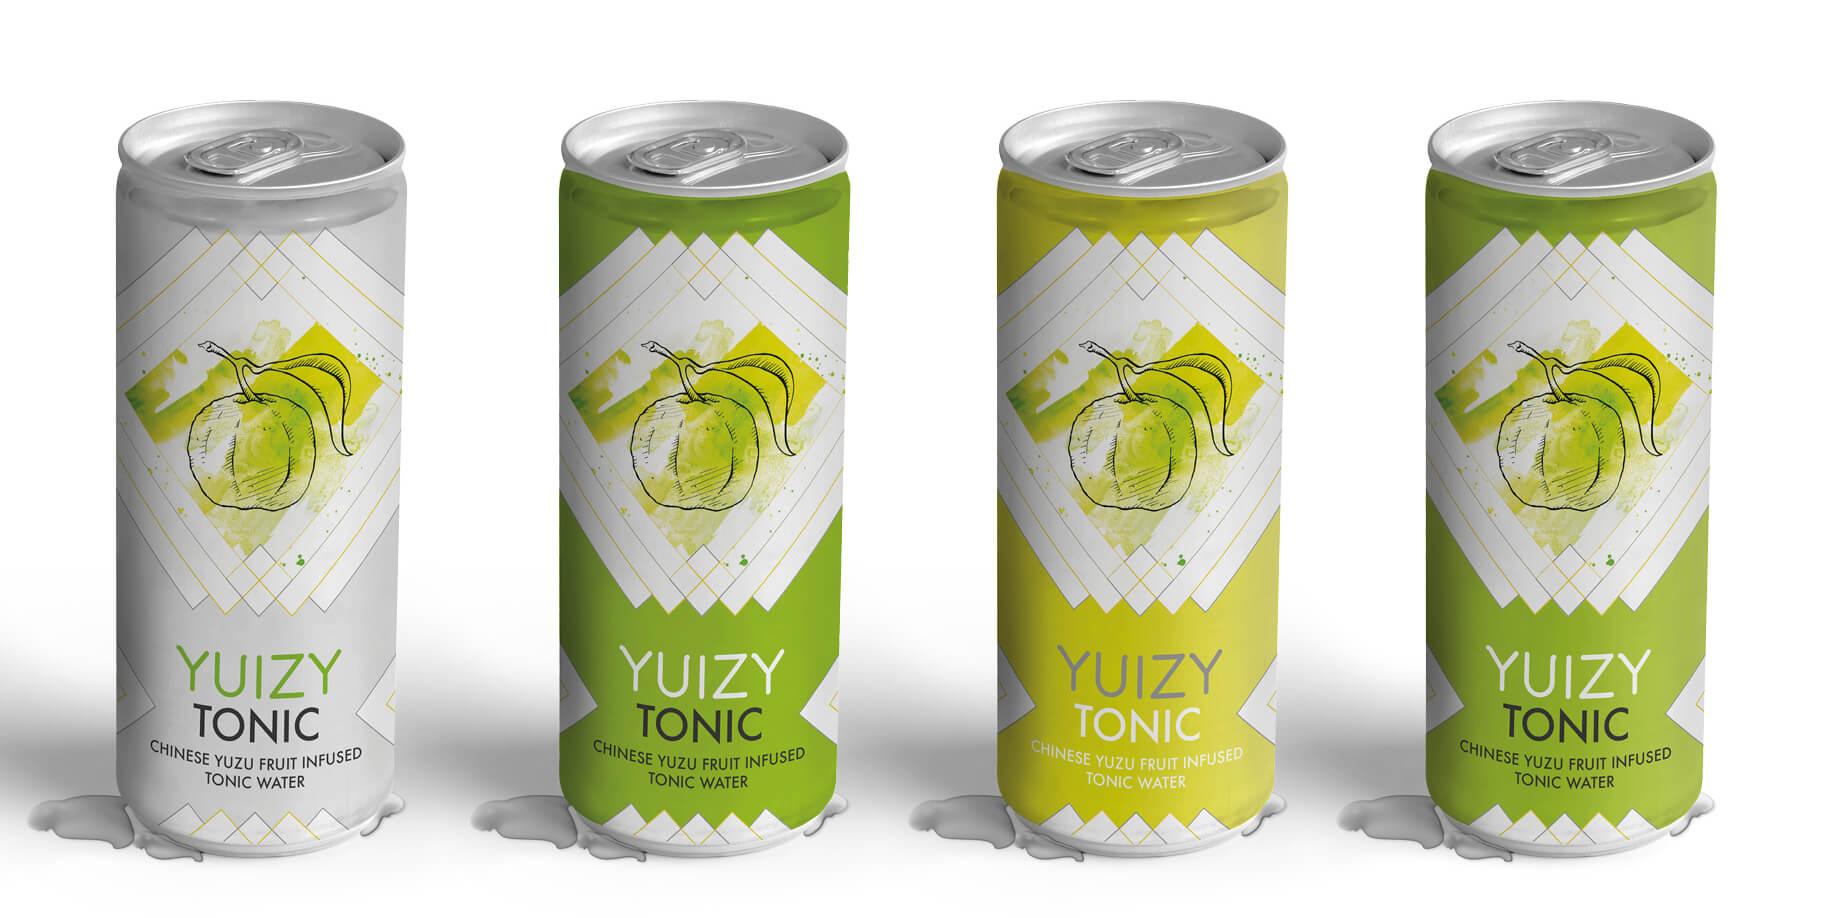 Verpackungsdesign Dose Gin Tonic